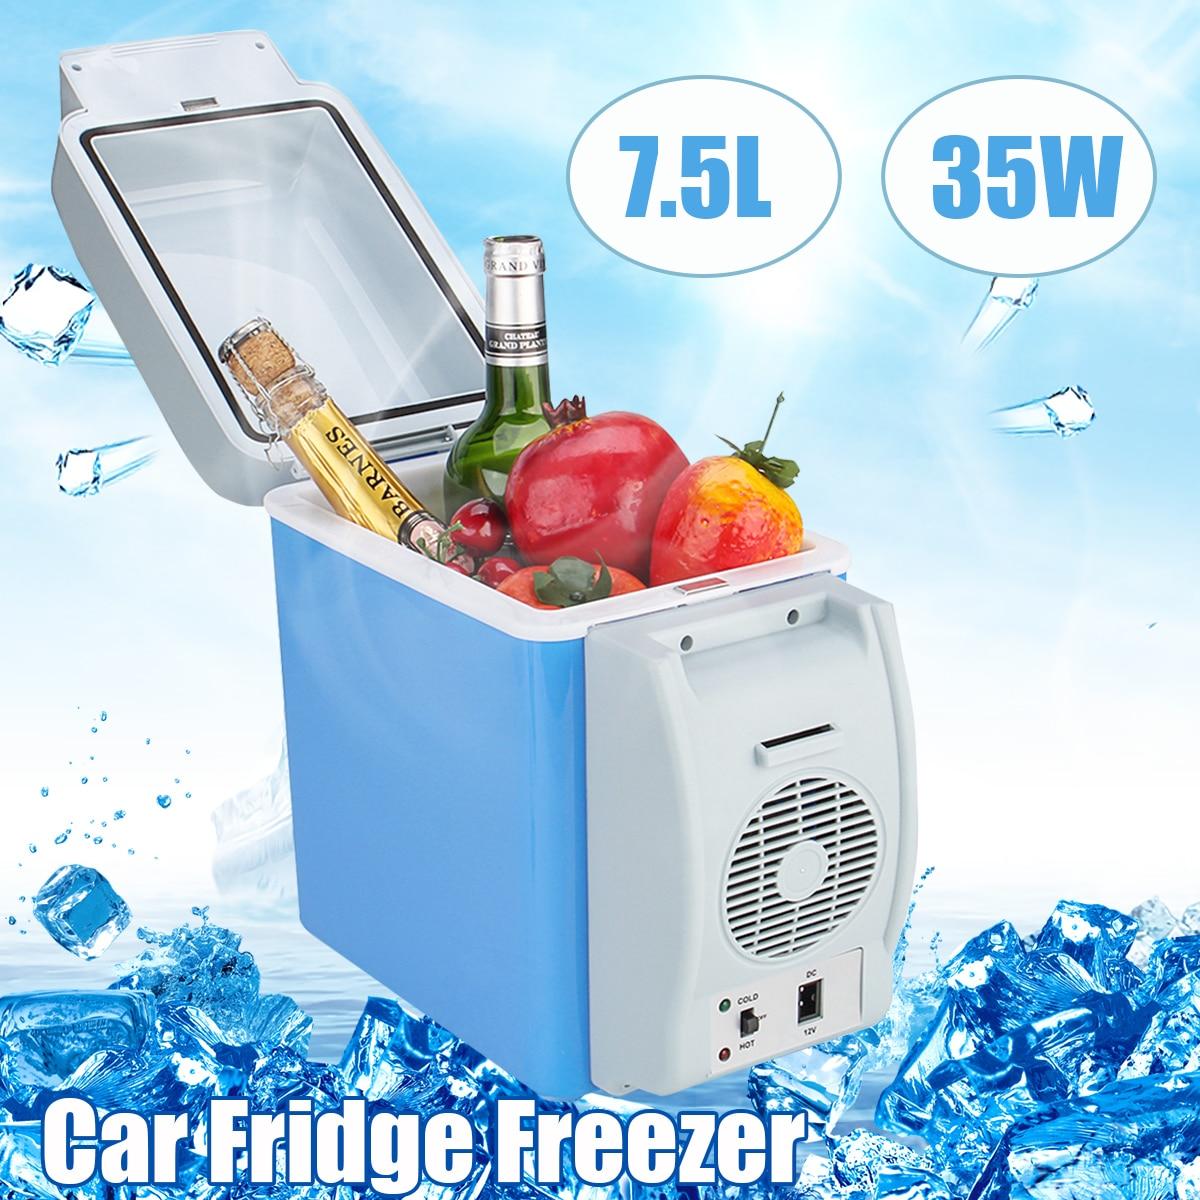 New 12V 7.5L 35W Mini Portable Car Refrigerator Cooler Freezer Car Fridge Freezer Cooler Warmer 2 Modes Box Fridge Travel Boat